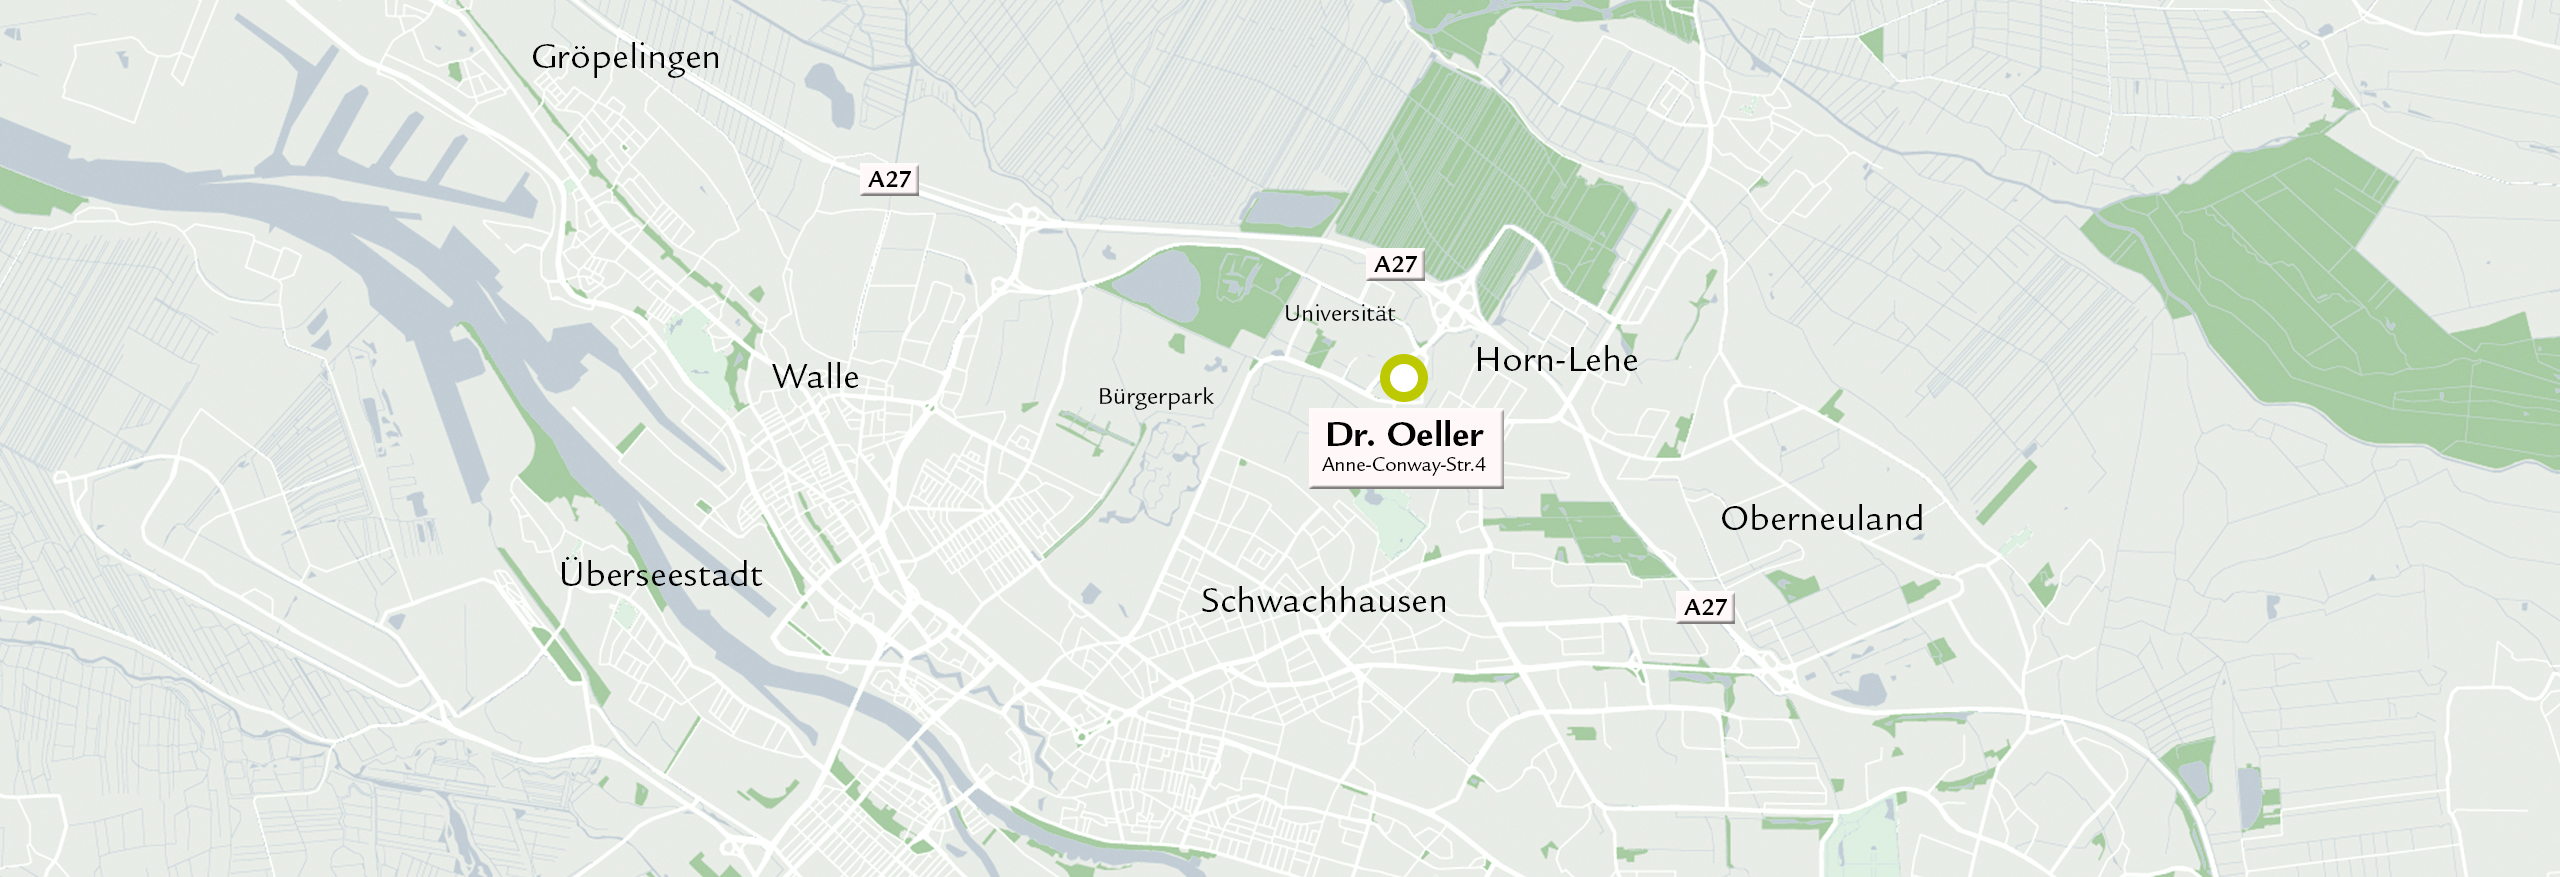 Karte Lage Praxis Dr. Oeller